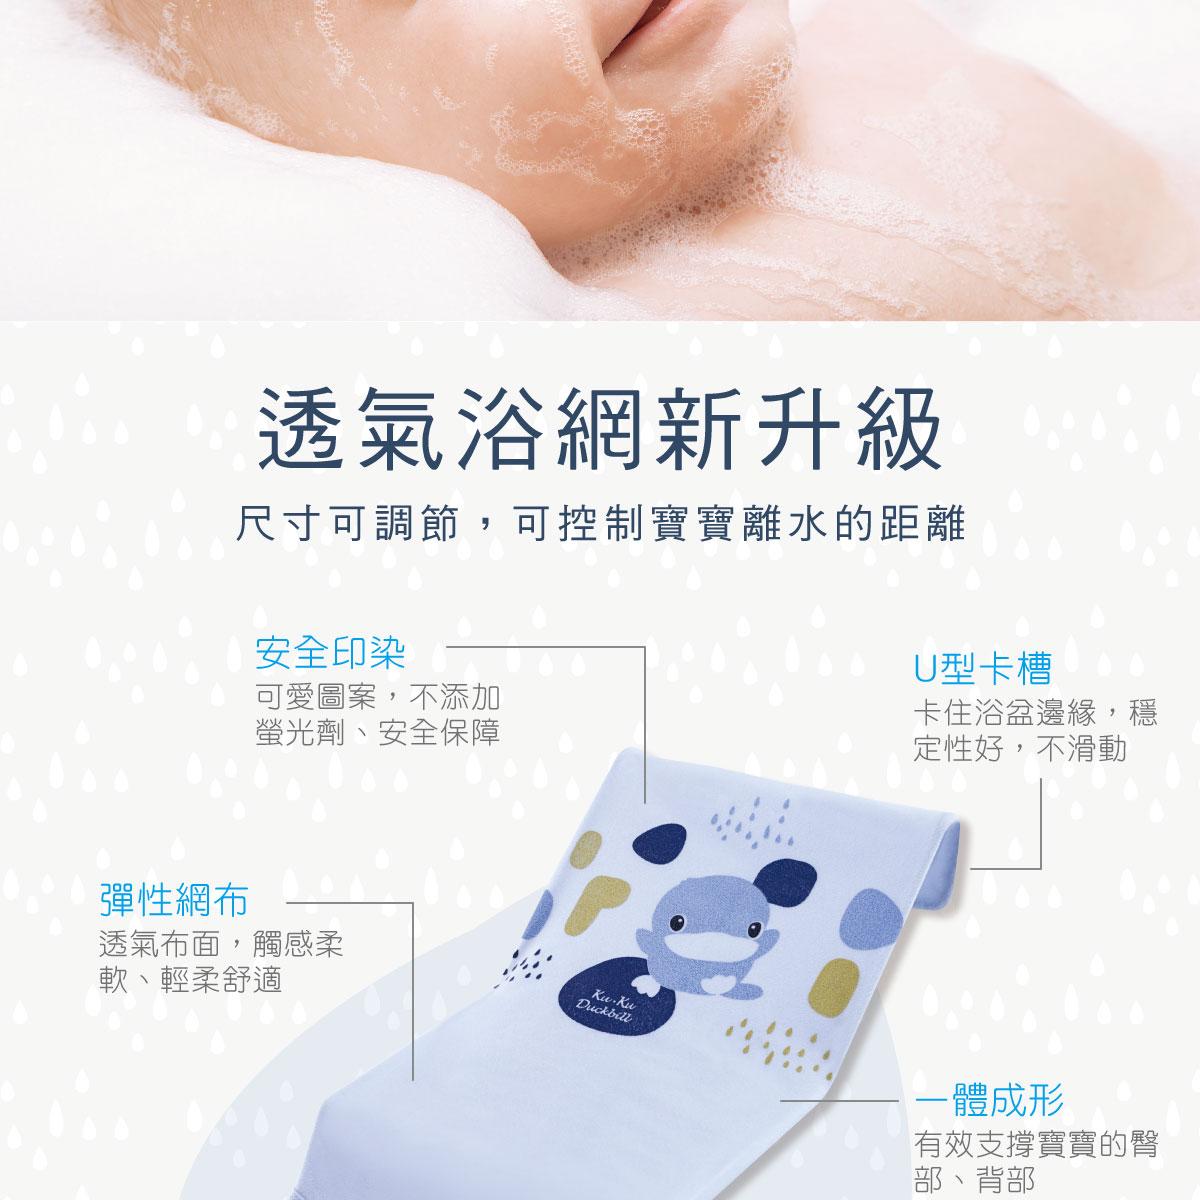 proimages/Bathing&CleanSeries/Bathing/BabyBathTub/1133/1133-成長印記沐浴床-EDM-2.jpg